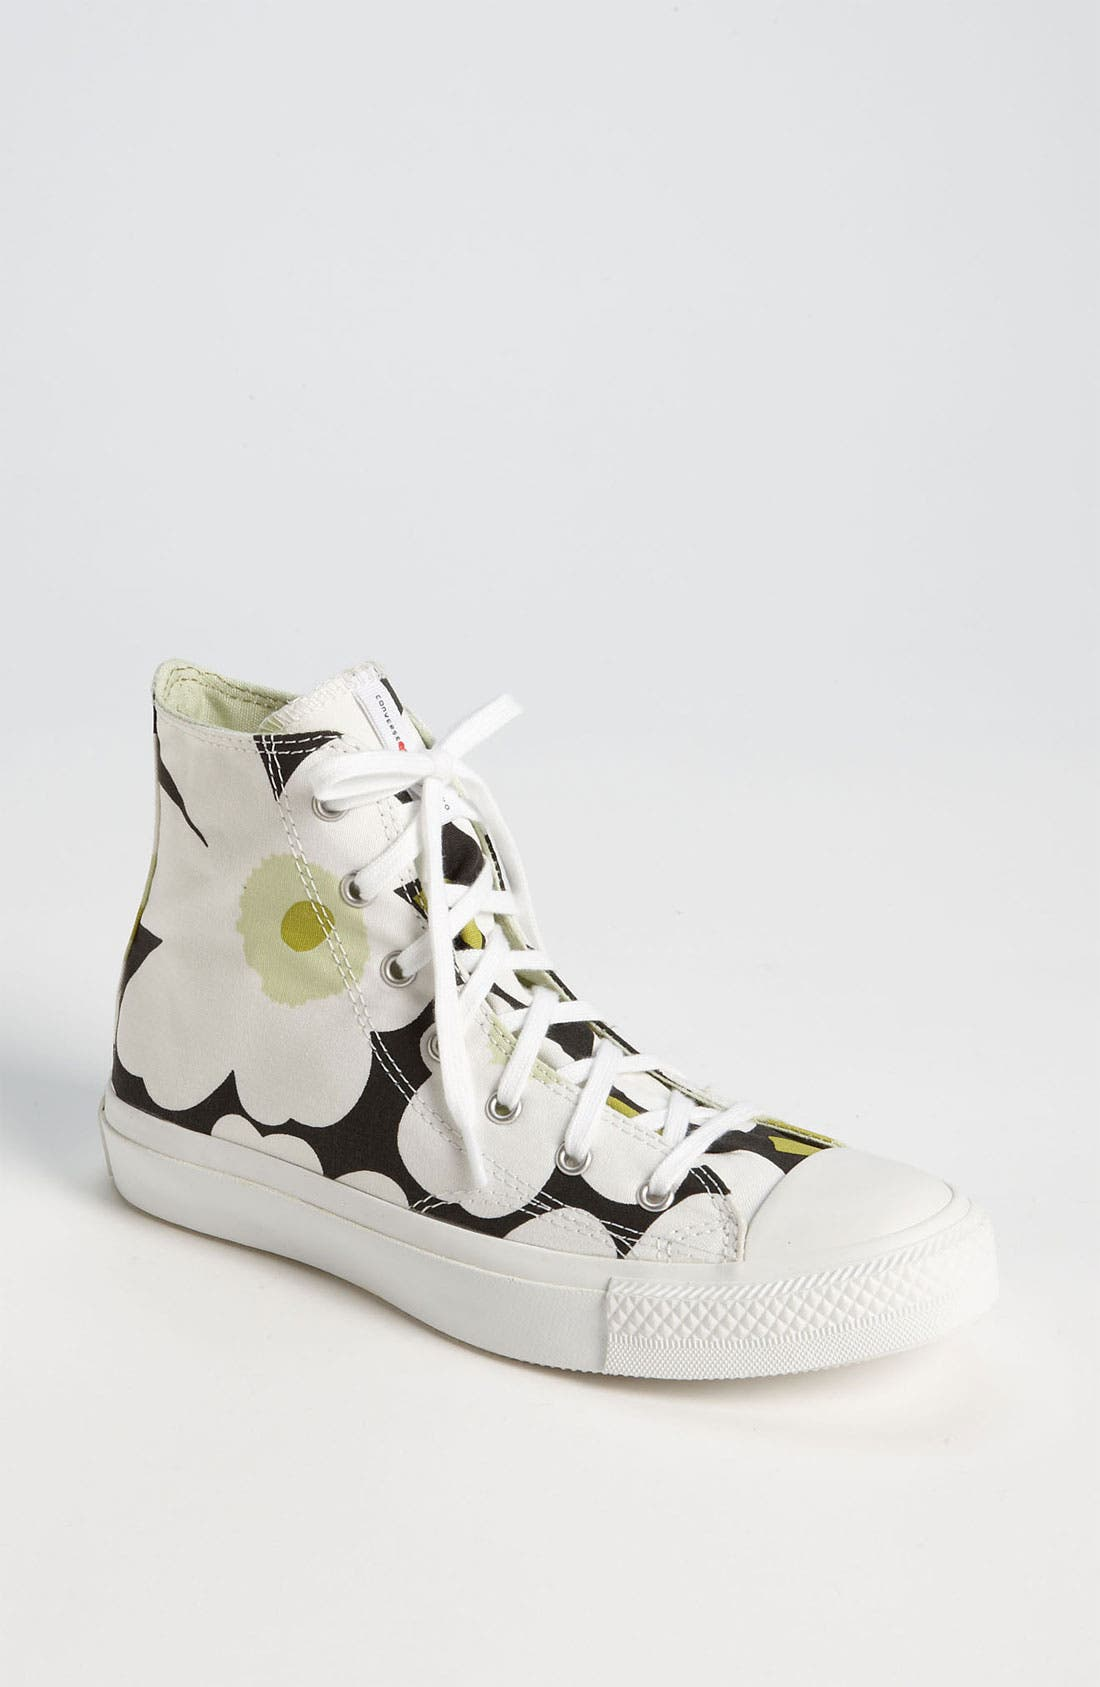 Alternate Image 1 Selected - Converse Chuck Taylor® All Star® 'Marimekko' High Top Sneaker (Women)